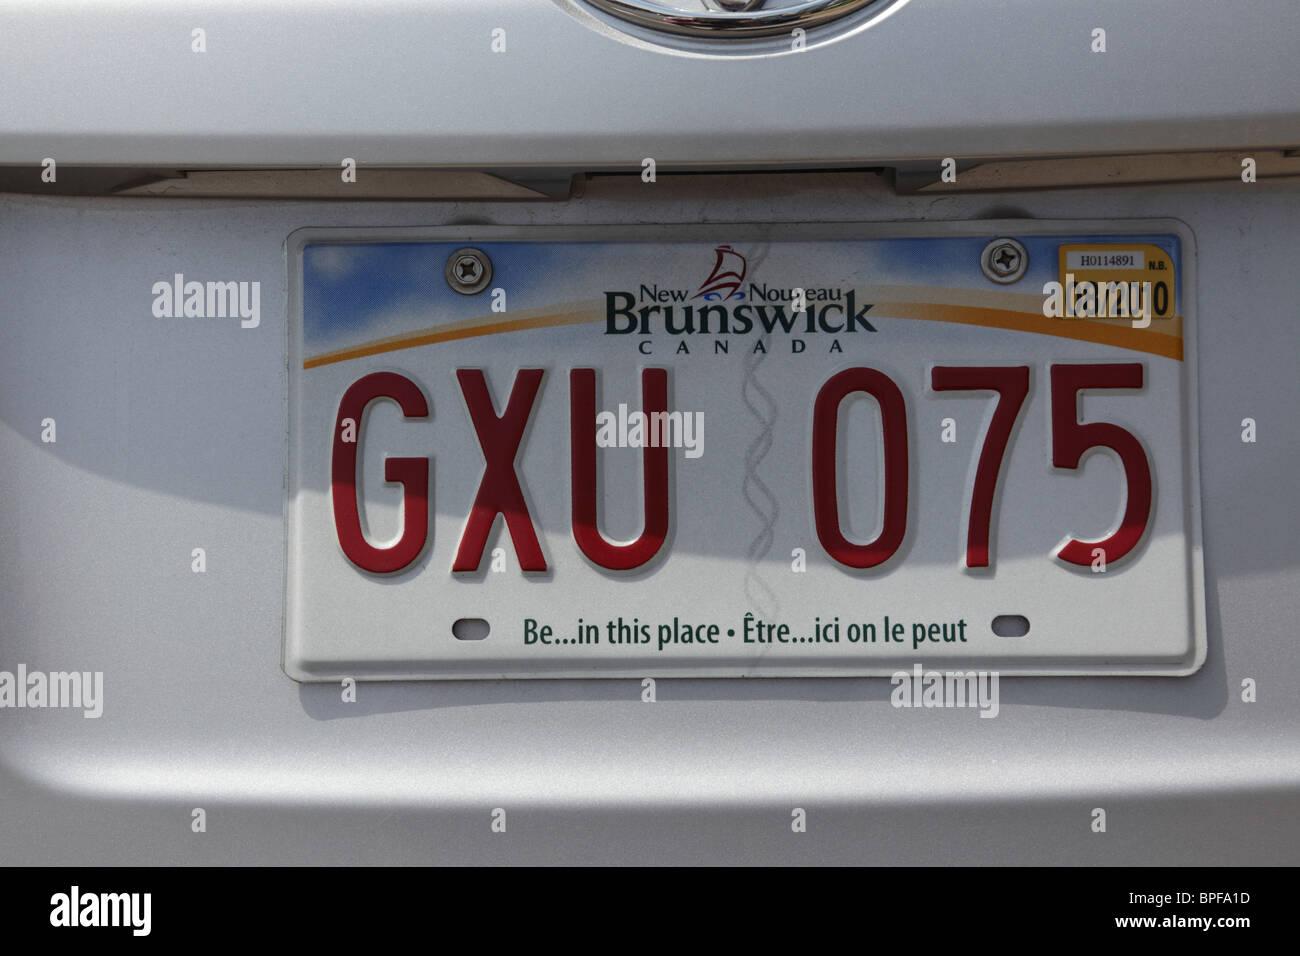 Inga Plaque dimmatriculation Photo Qu/ébec Canada 6x12